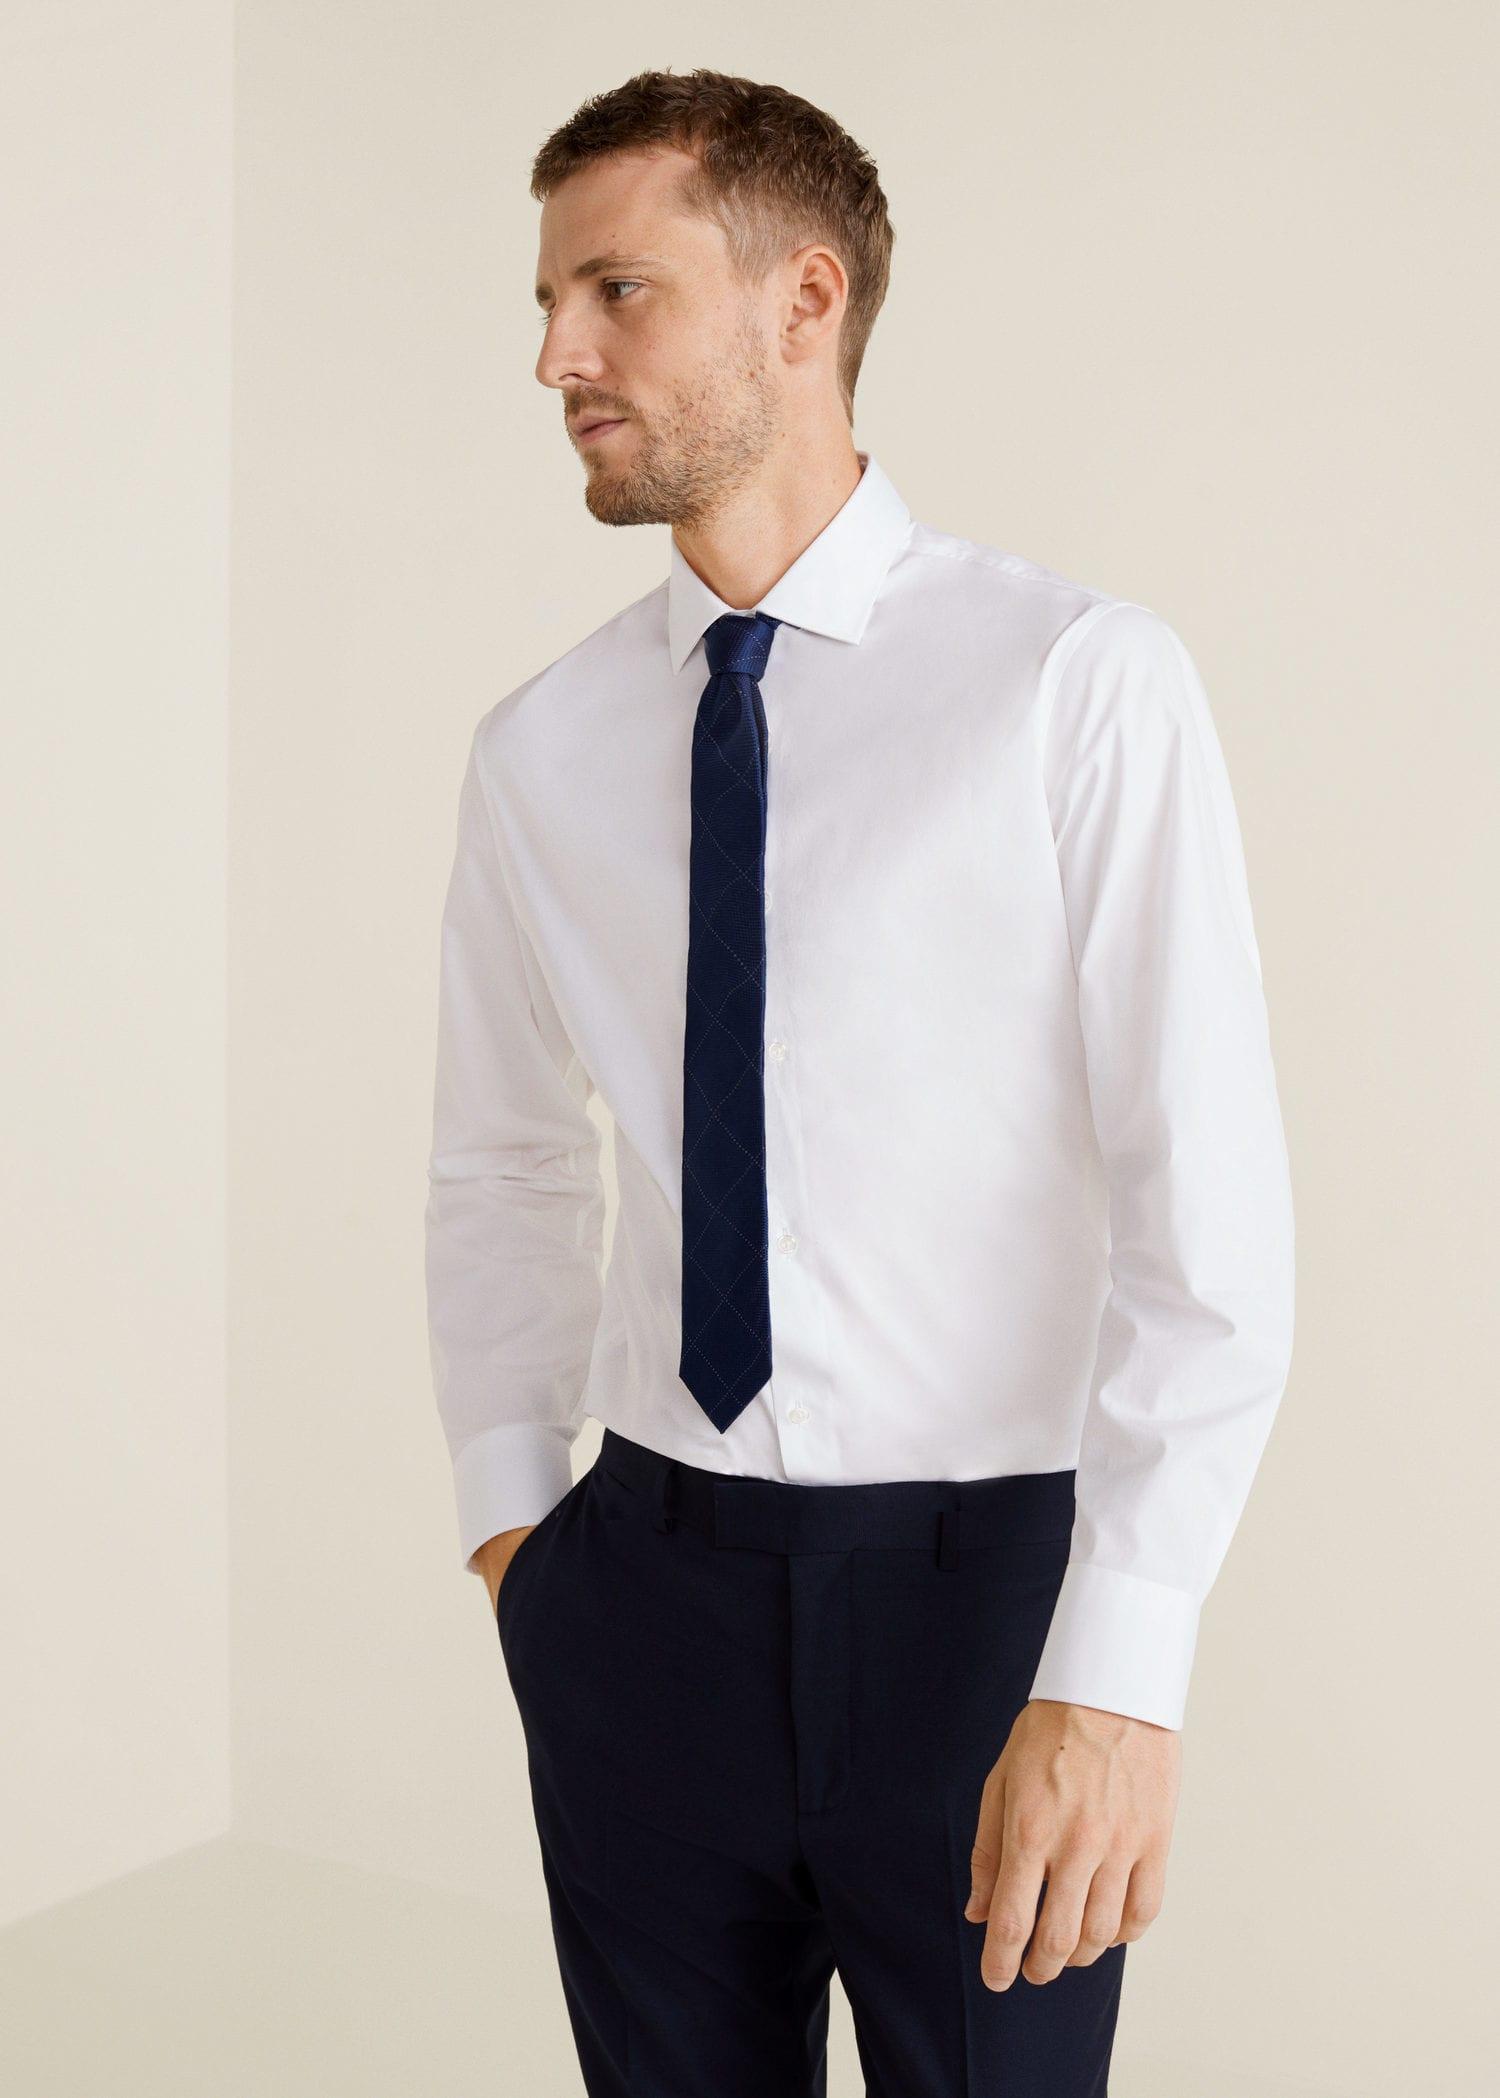 hacerse un traje a medida guia definitiva moda masculina madmenmag